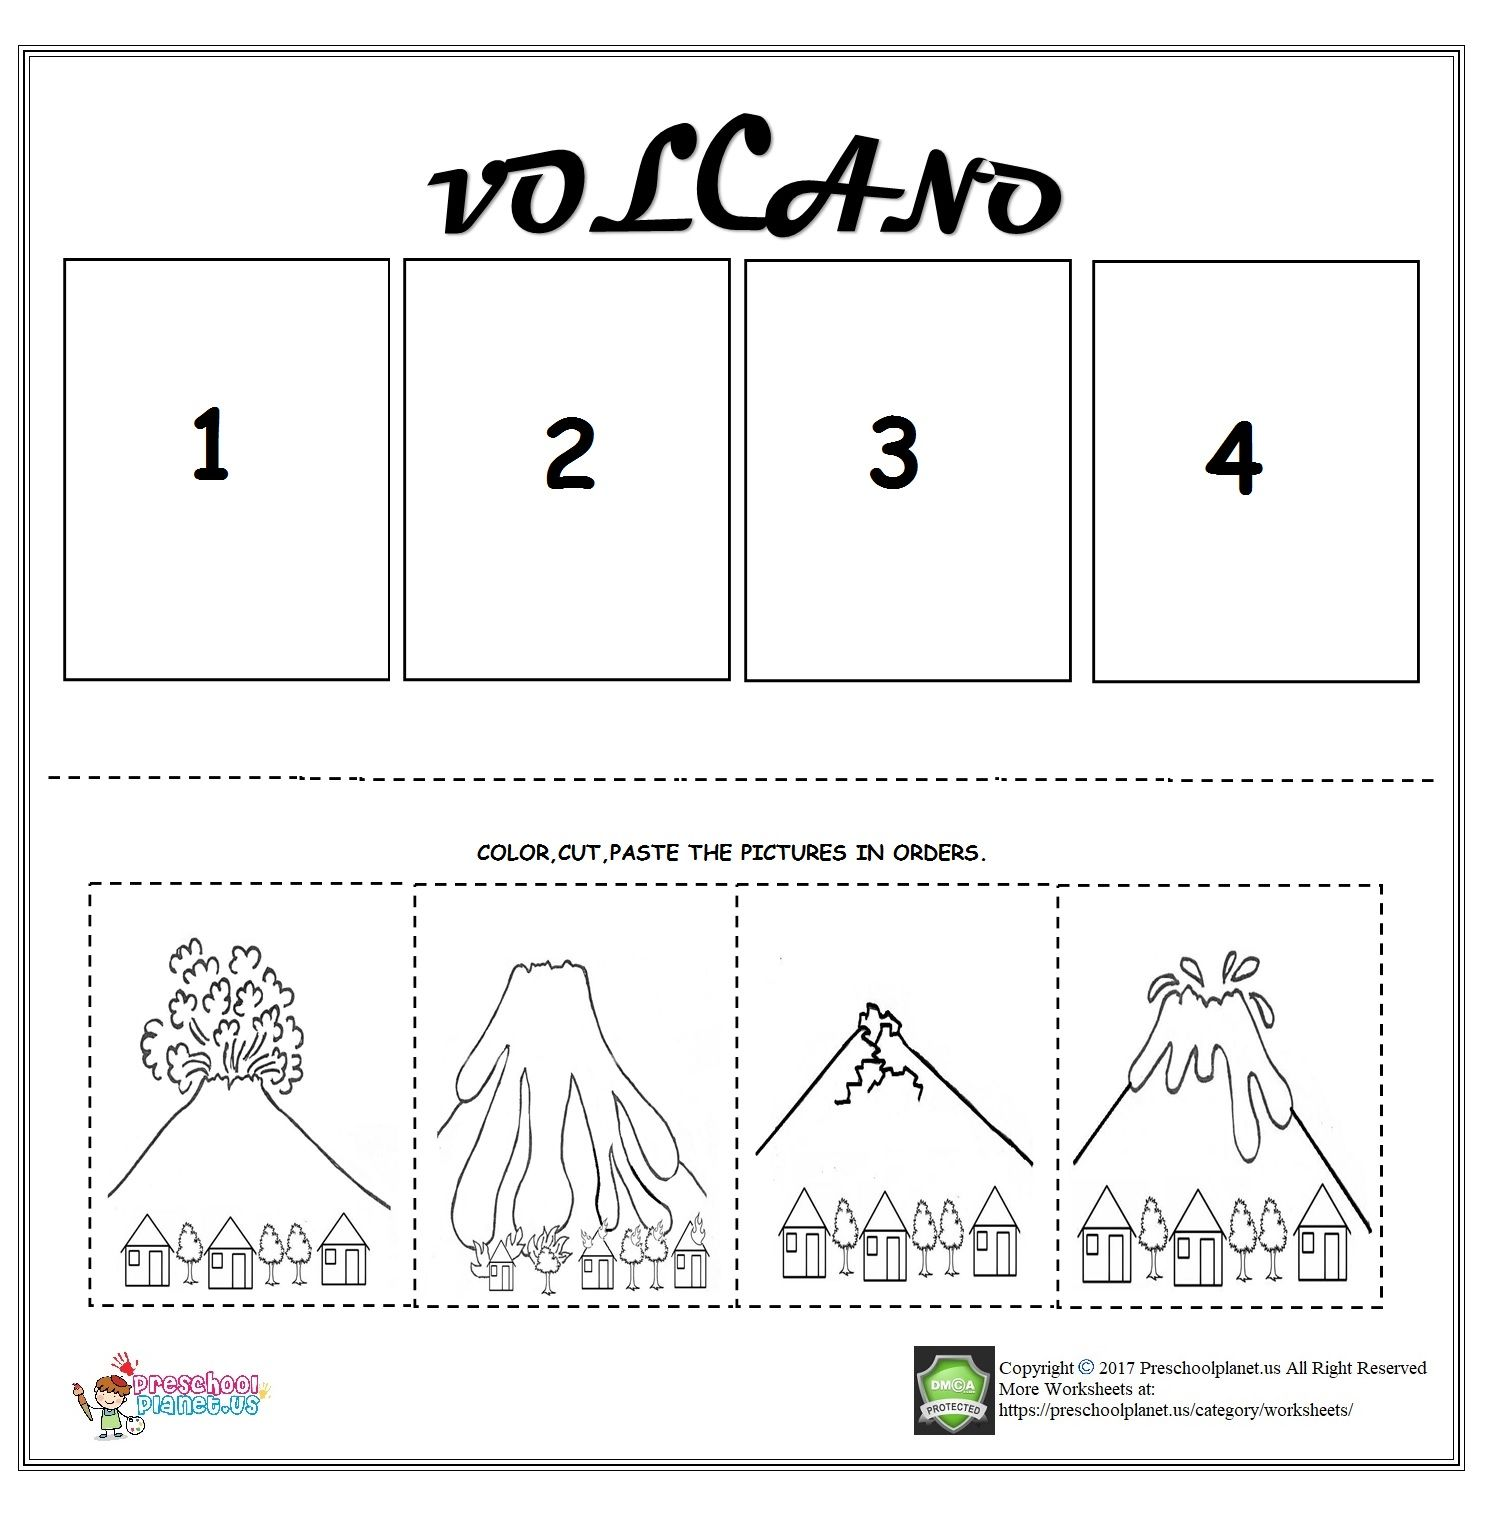 medium resolution of Volcano sequencing worksheet for kids   Kindergarten sequencing worksheets